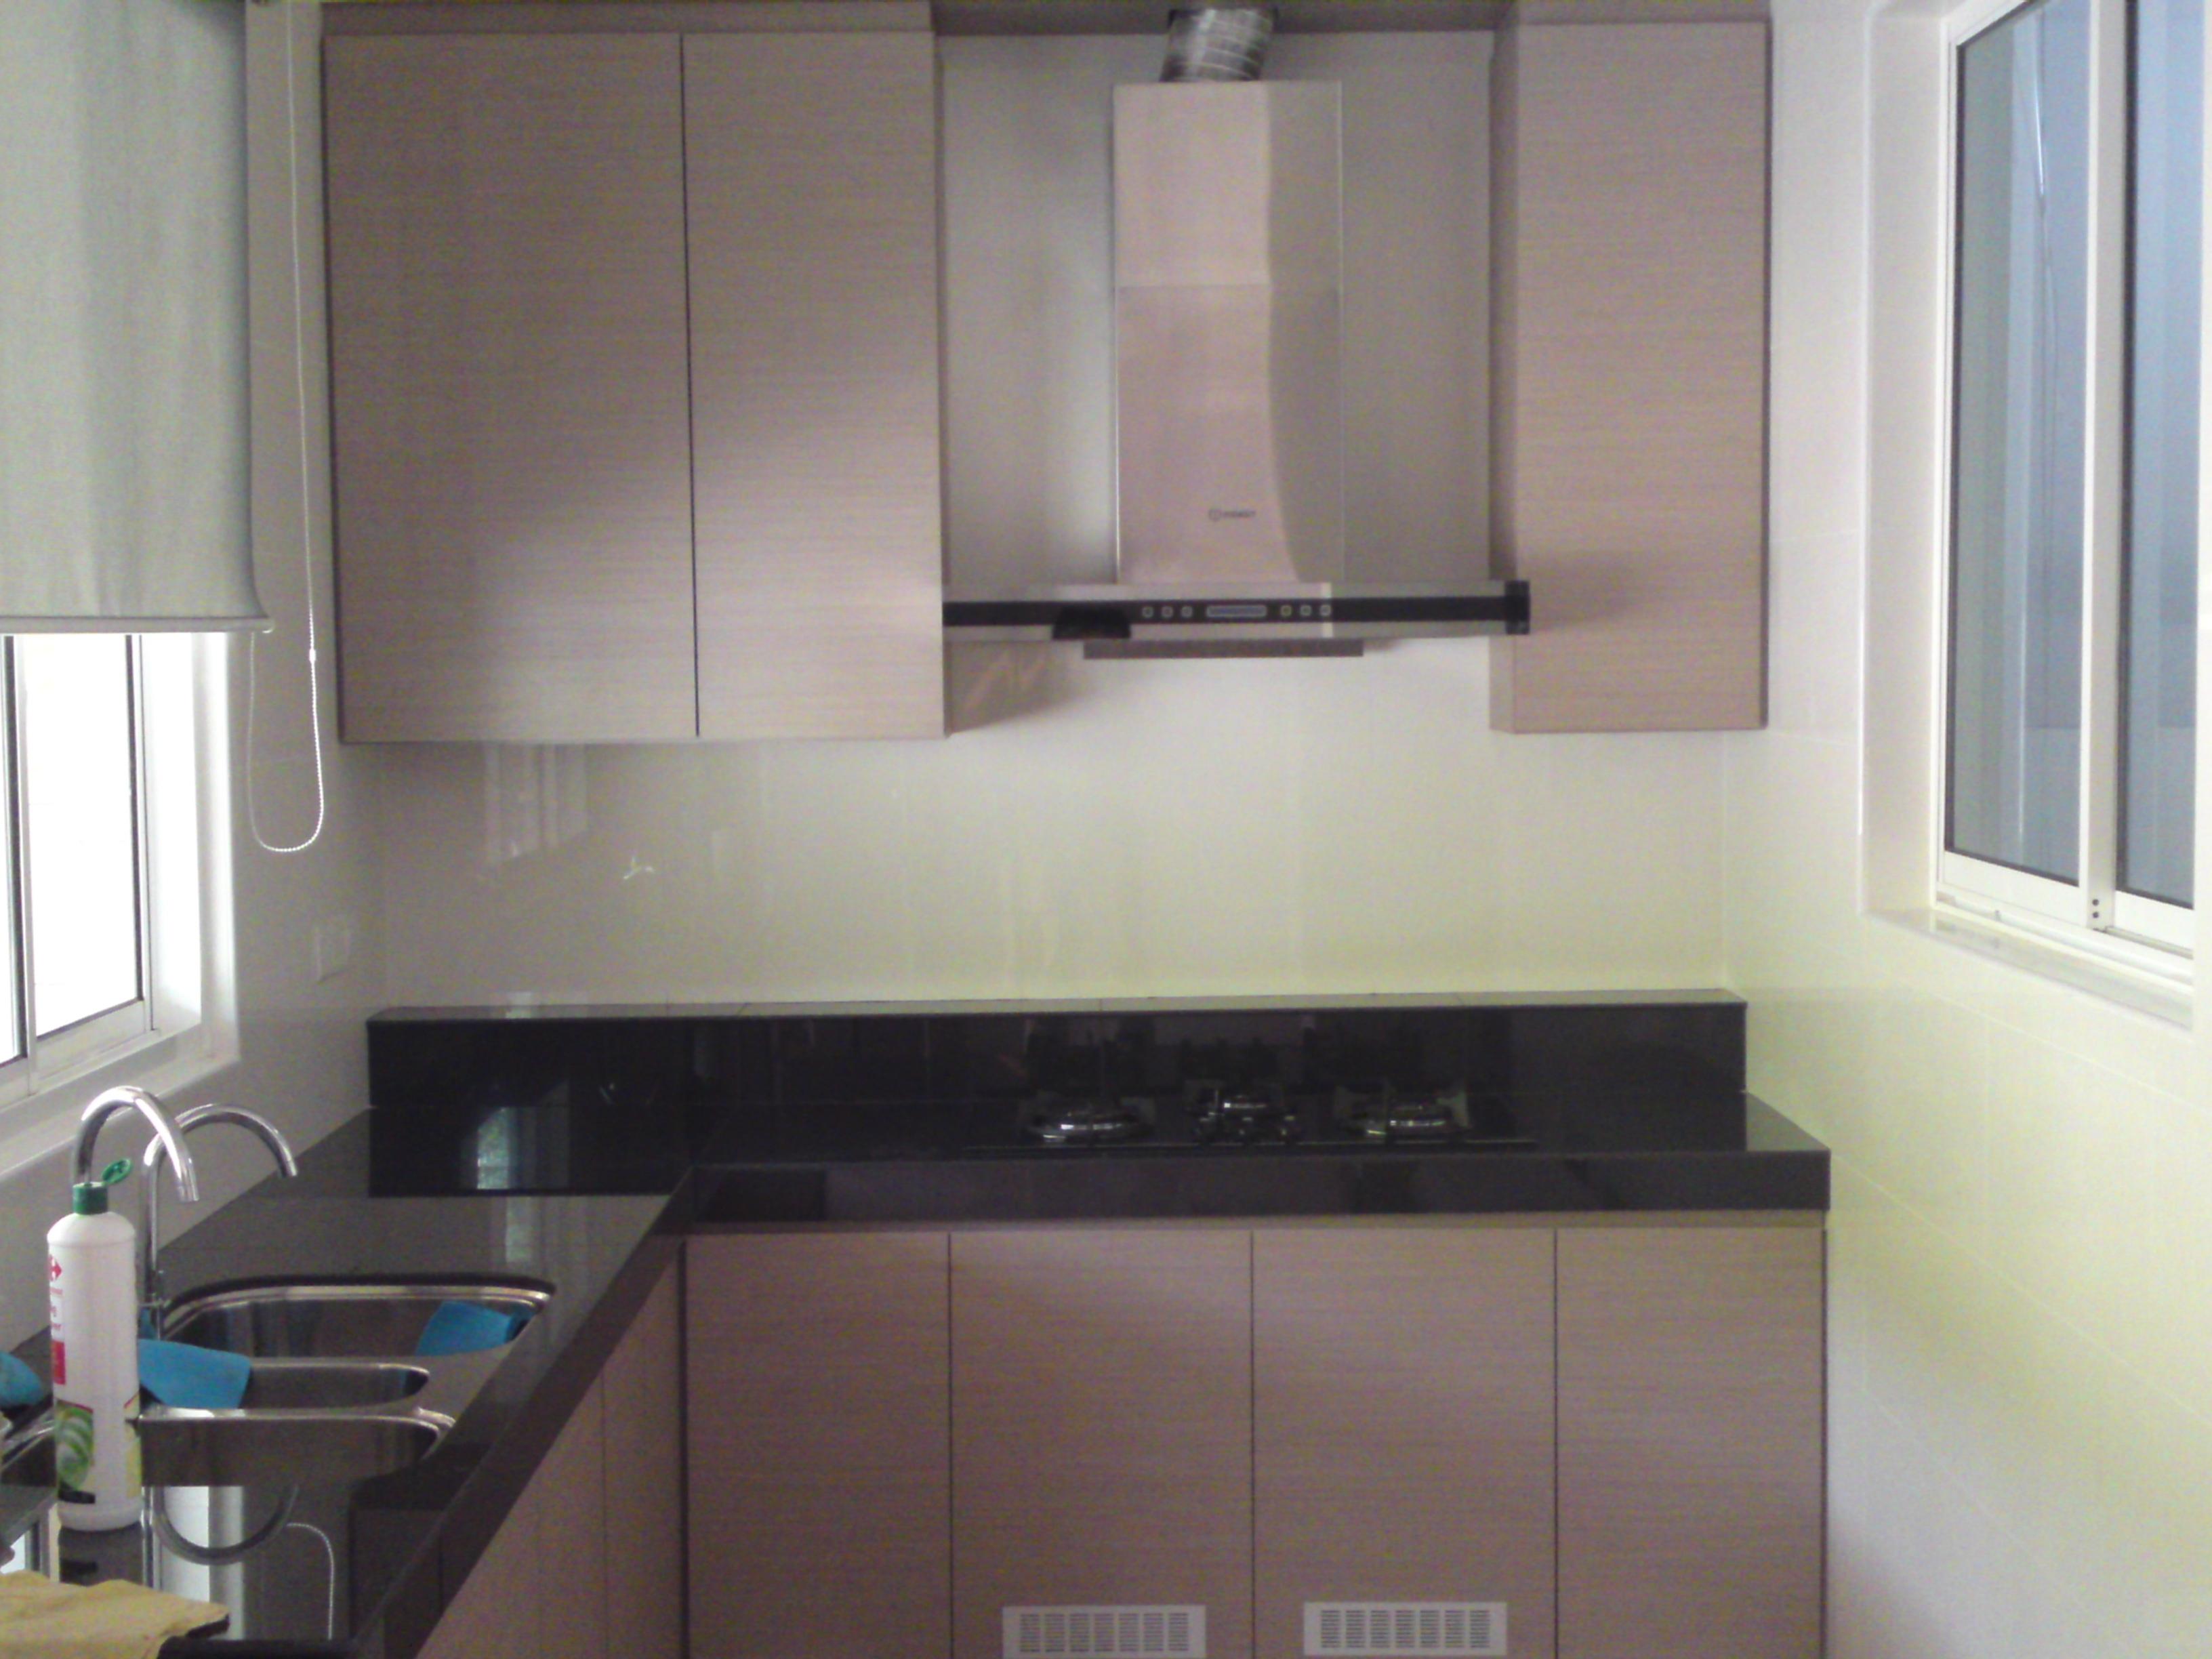 kitchen cabinet ecstatify laminate kitchen cabinets materials formica kitchen cabinets laminate kitchen cabinets painting or refacing formica cabinets